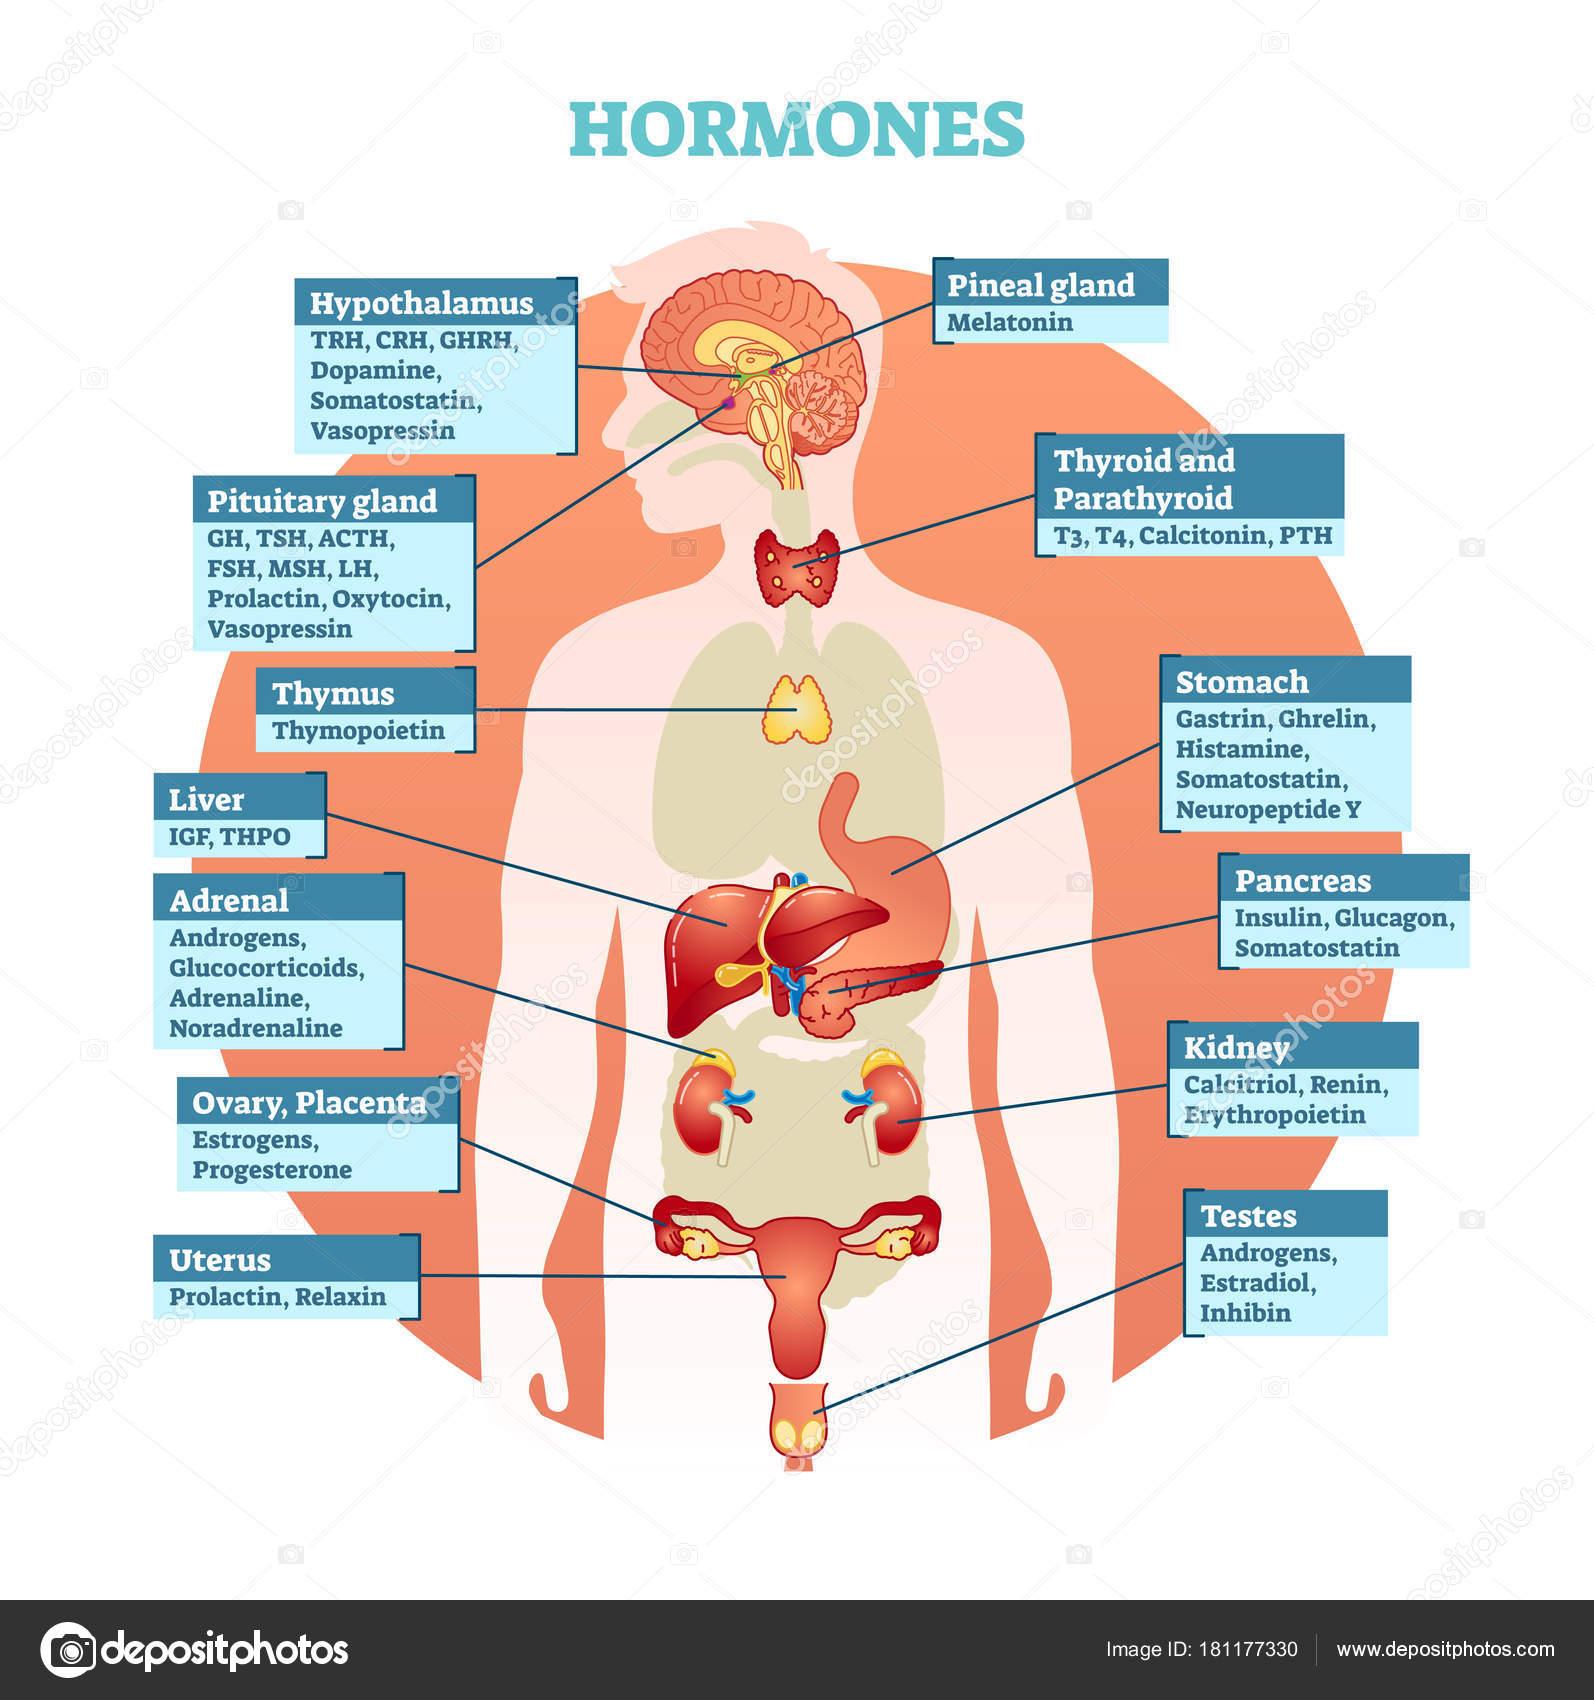 Menschlichen Körper Hormone Vektor-Illustration-Diagramm ...